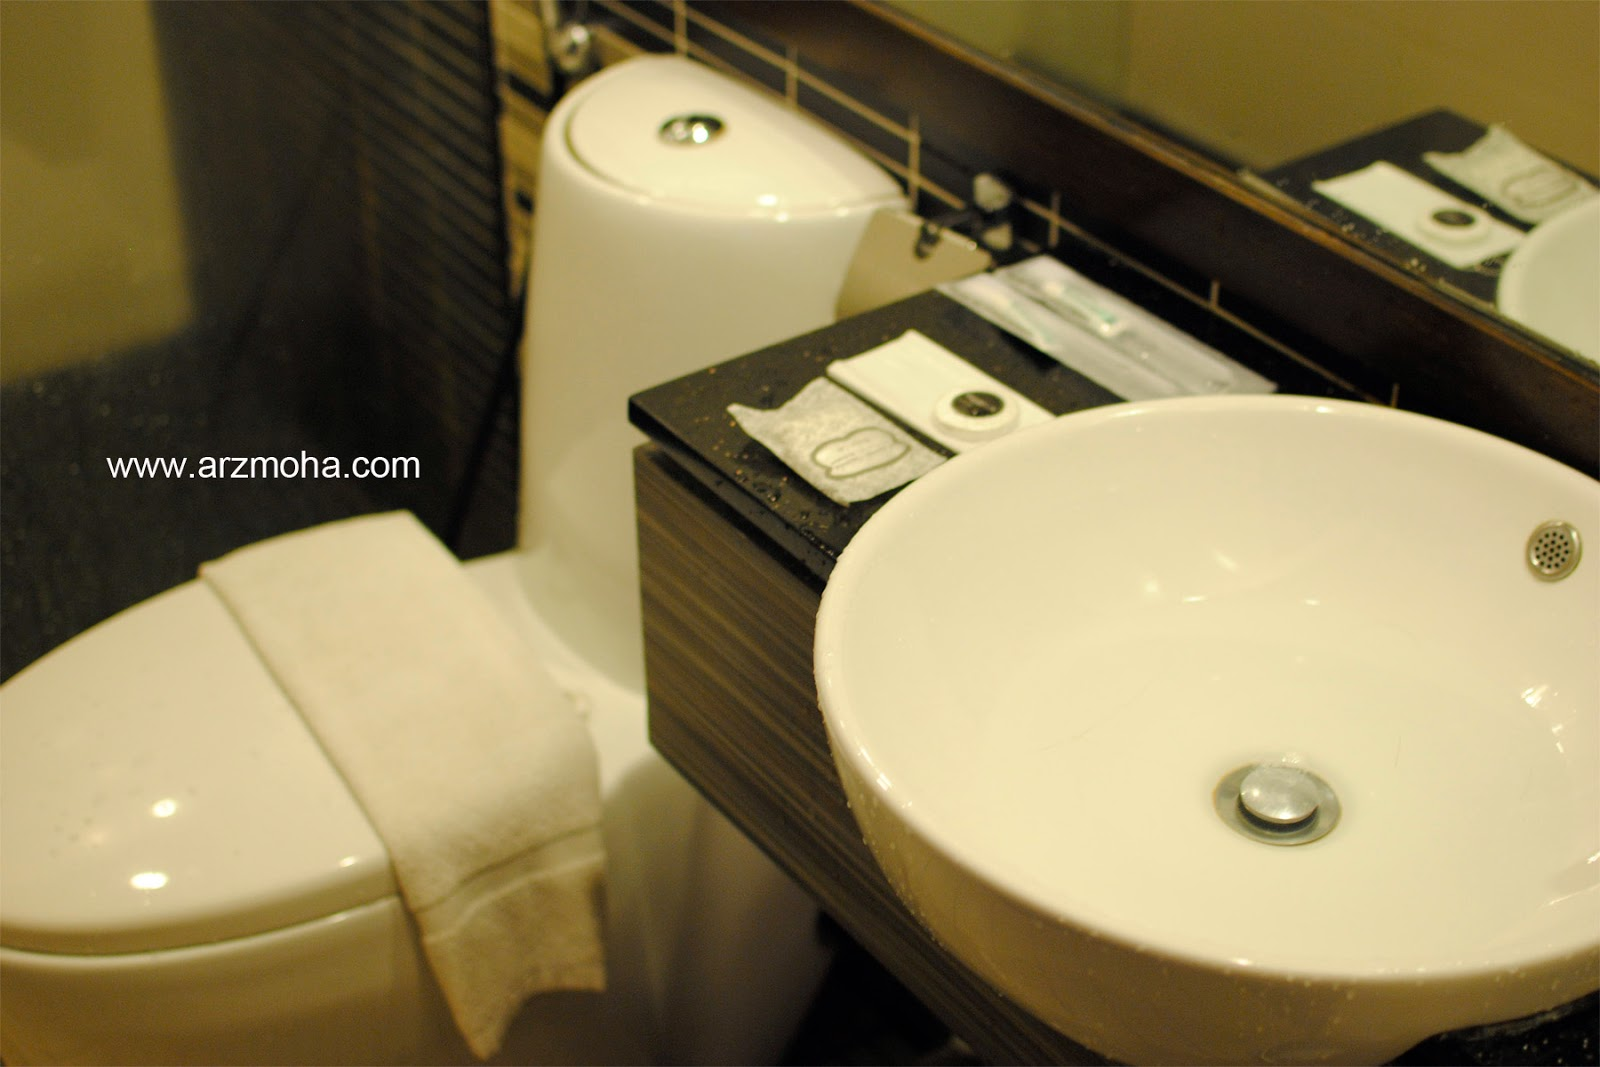 gambar cantik, jurugambar, flemington hotel, visit taiping, perak, malaysia,